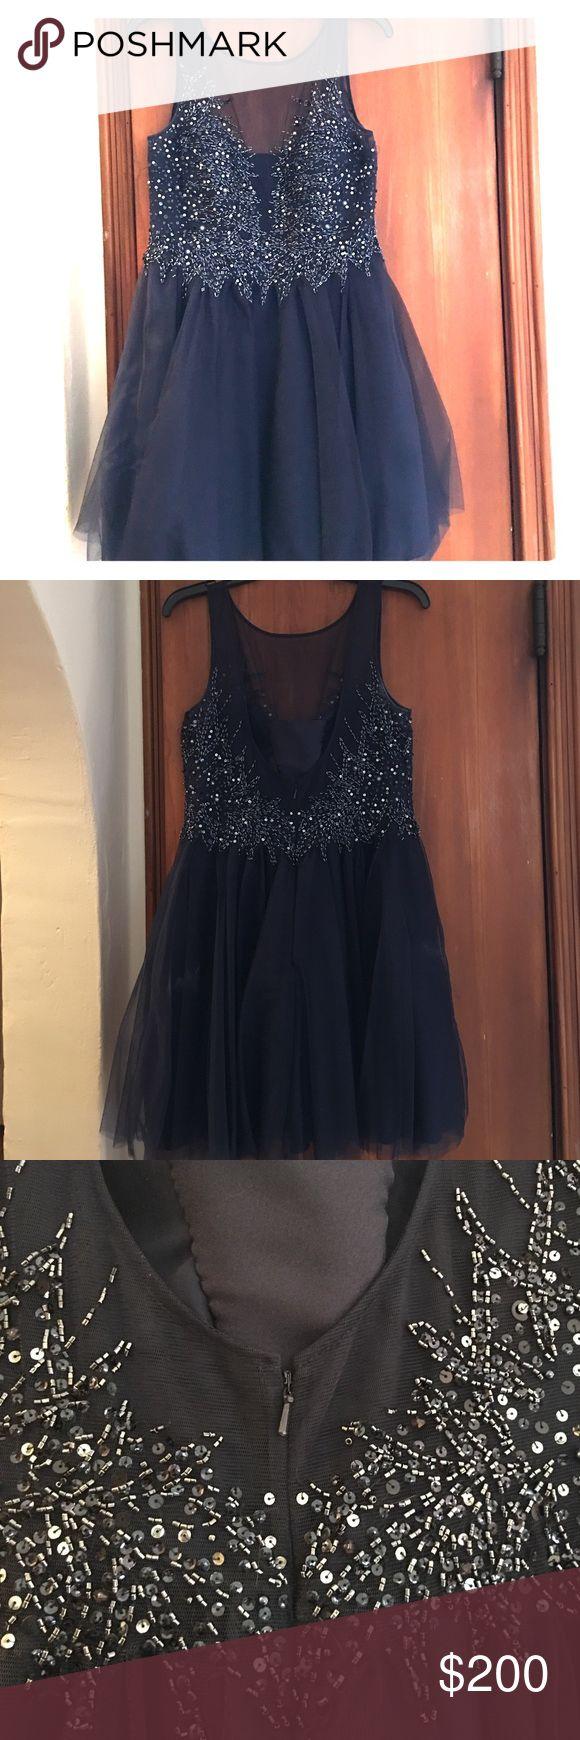 Selling this Navy blue formal dress on Poshmark! My username is: stephemrey. #shopmycloset #poshmark #fashion #shopping #style #forsale #camille la vie  #Dresses & Skirts